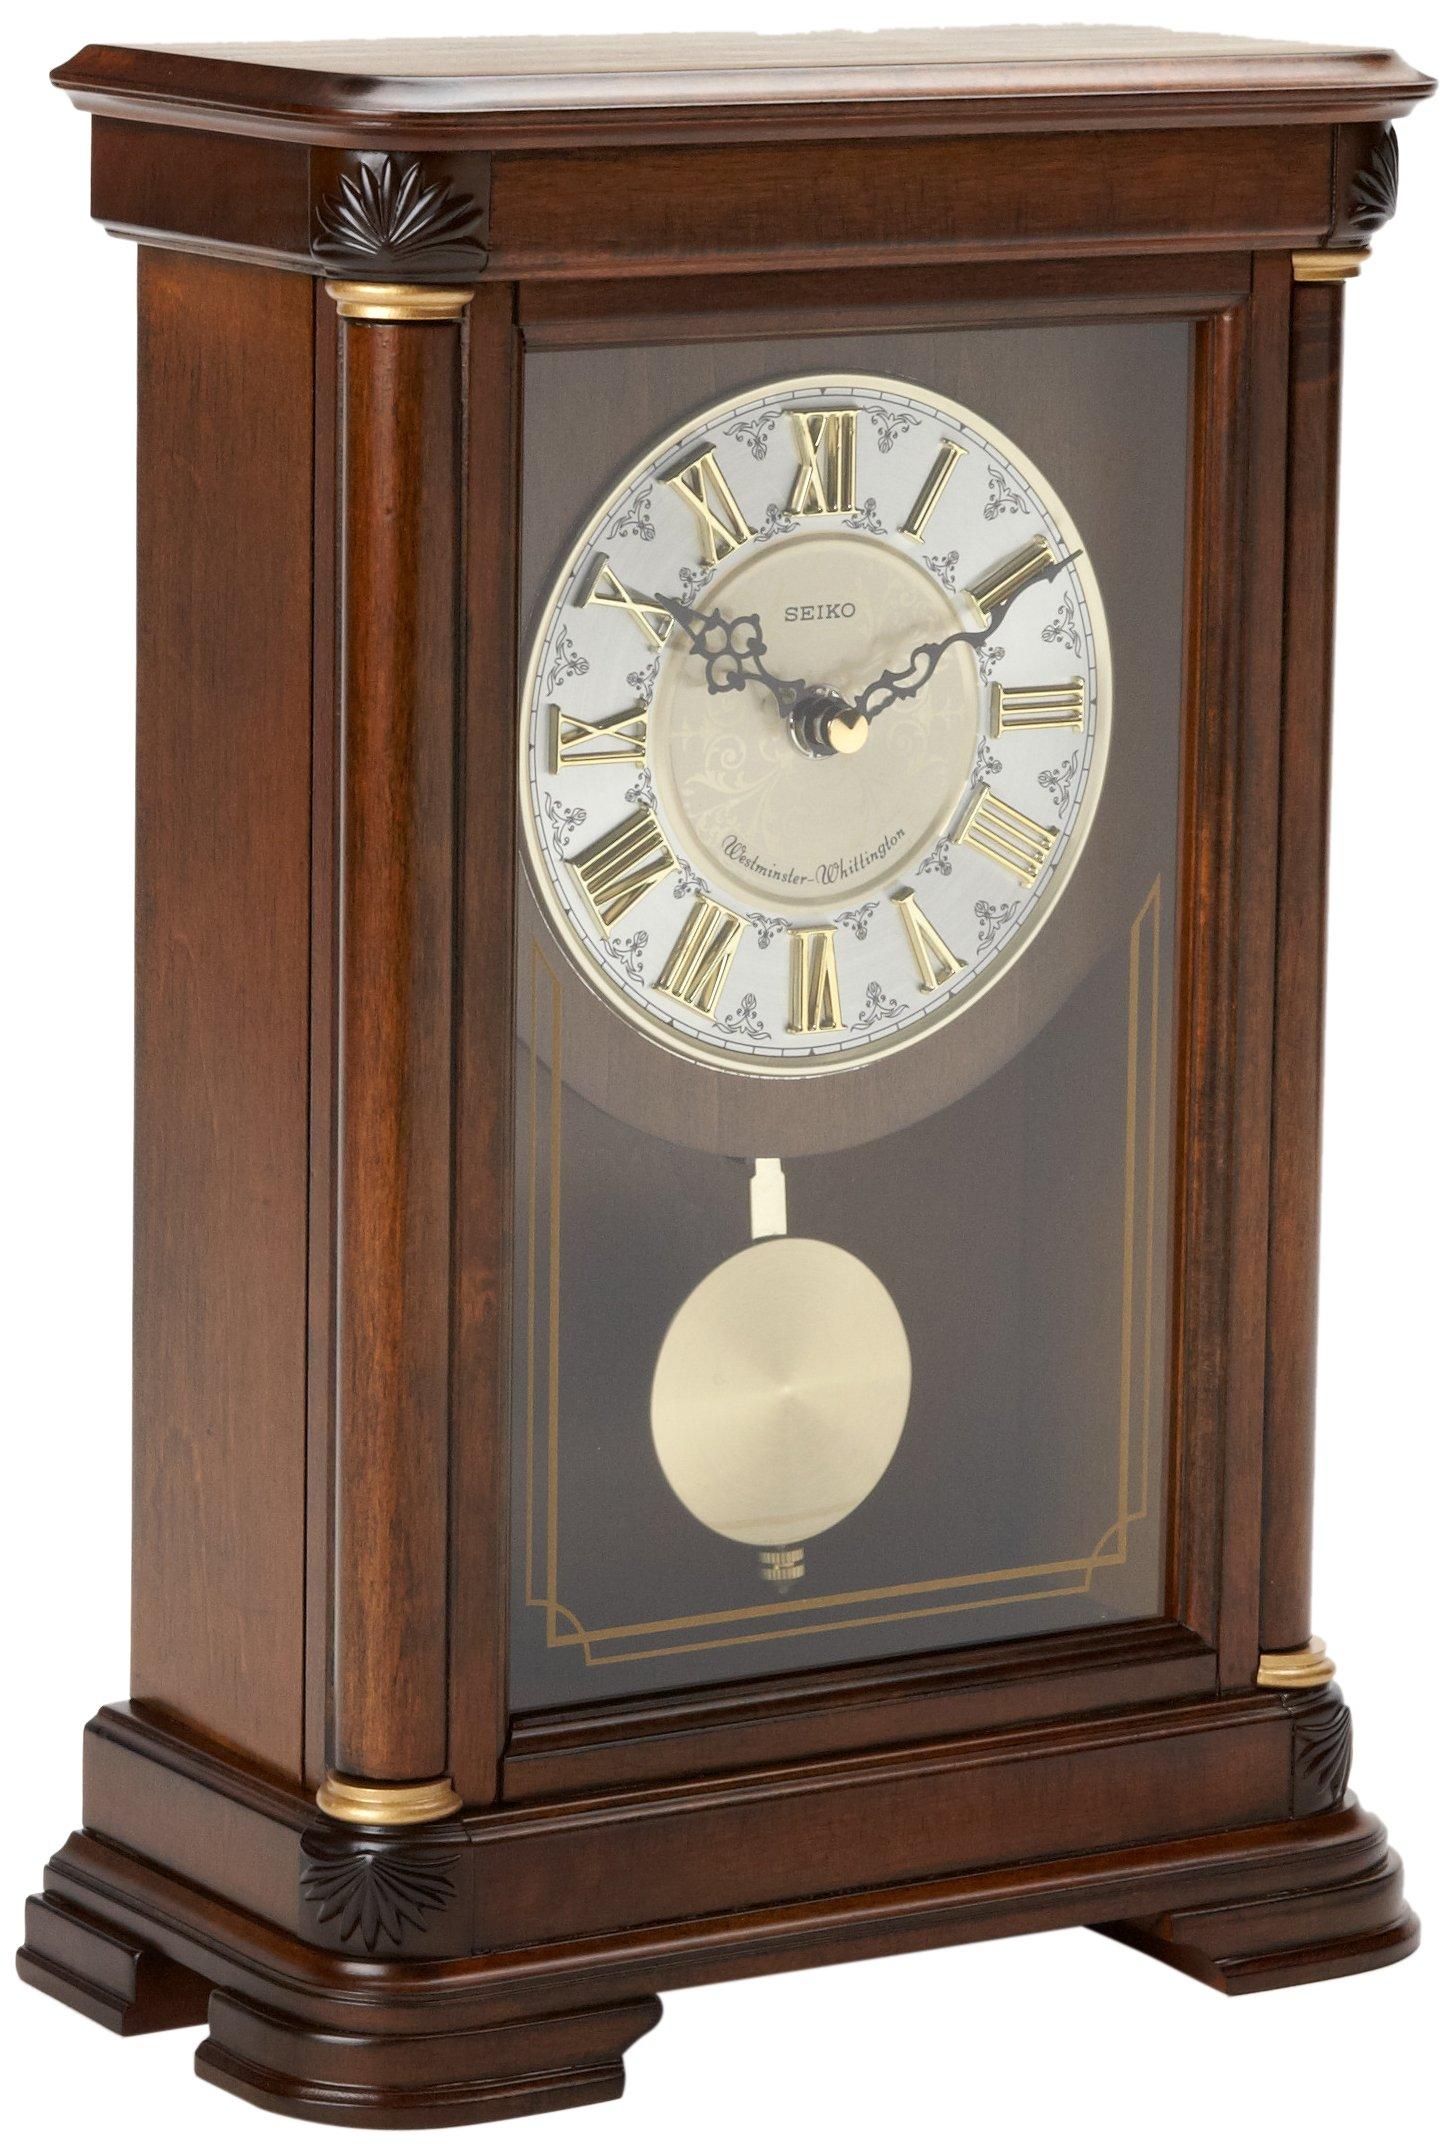 Seiko Mantel Chime with Pendulum Clock Brown Alder Case Ornamental Dial by SEIKO